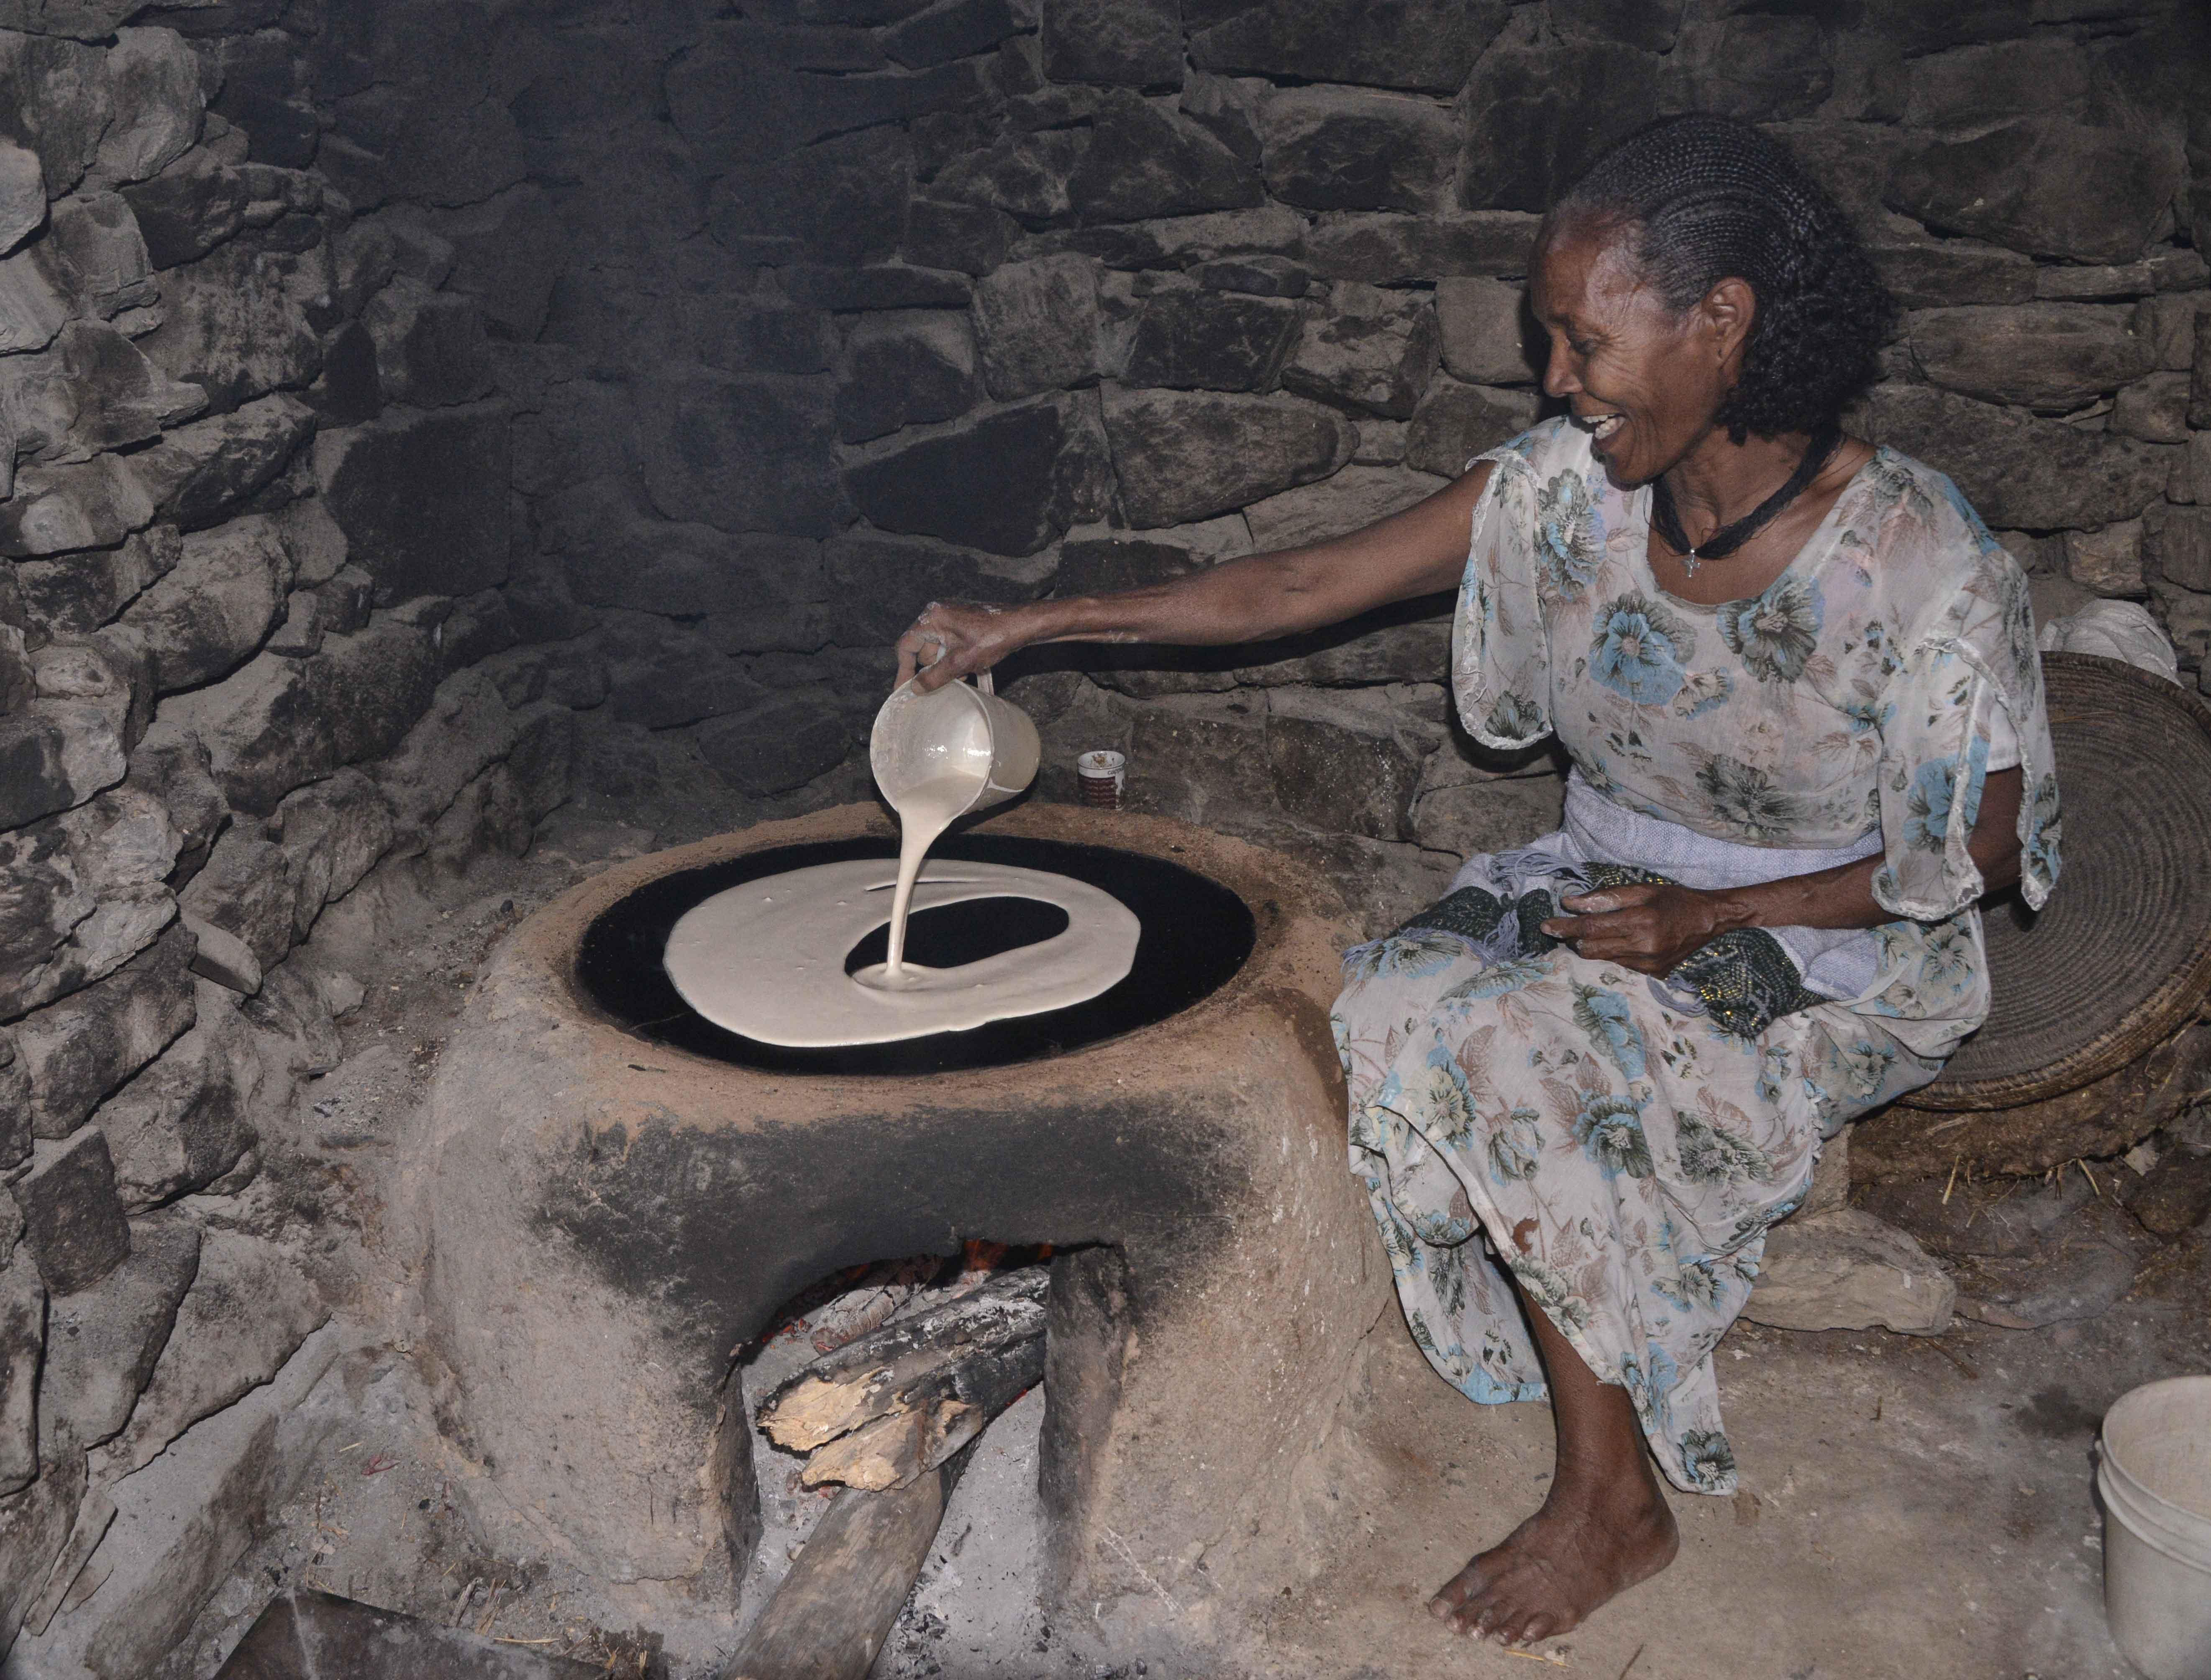 Http Commons Wikimedia Org Wiki File Making Injera Mekele 9816380964 Jpg